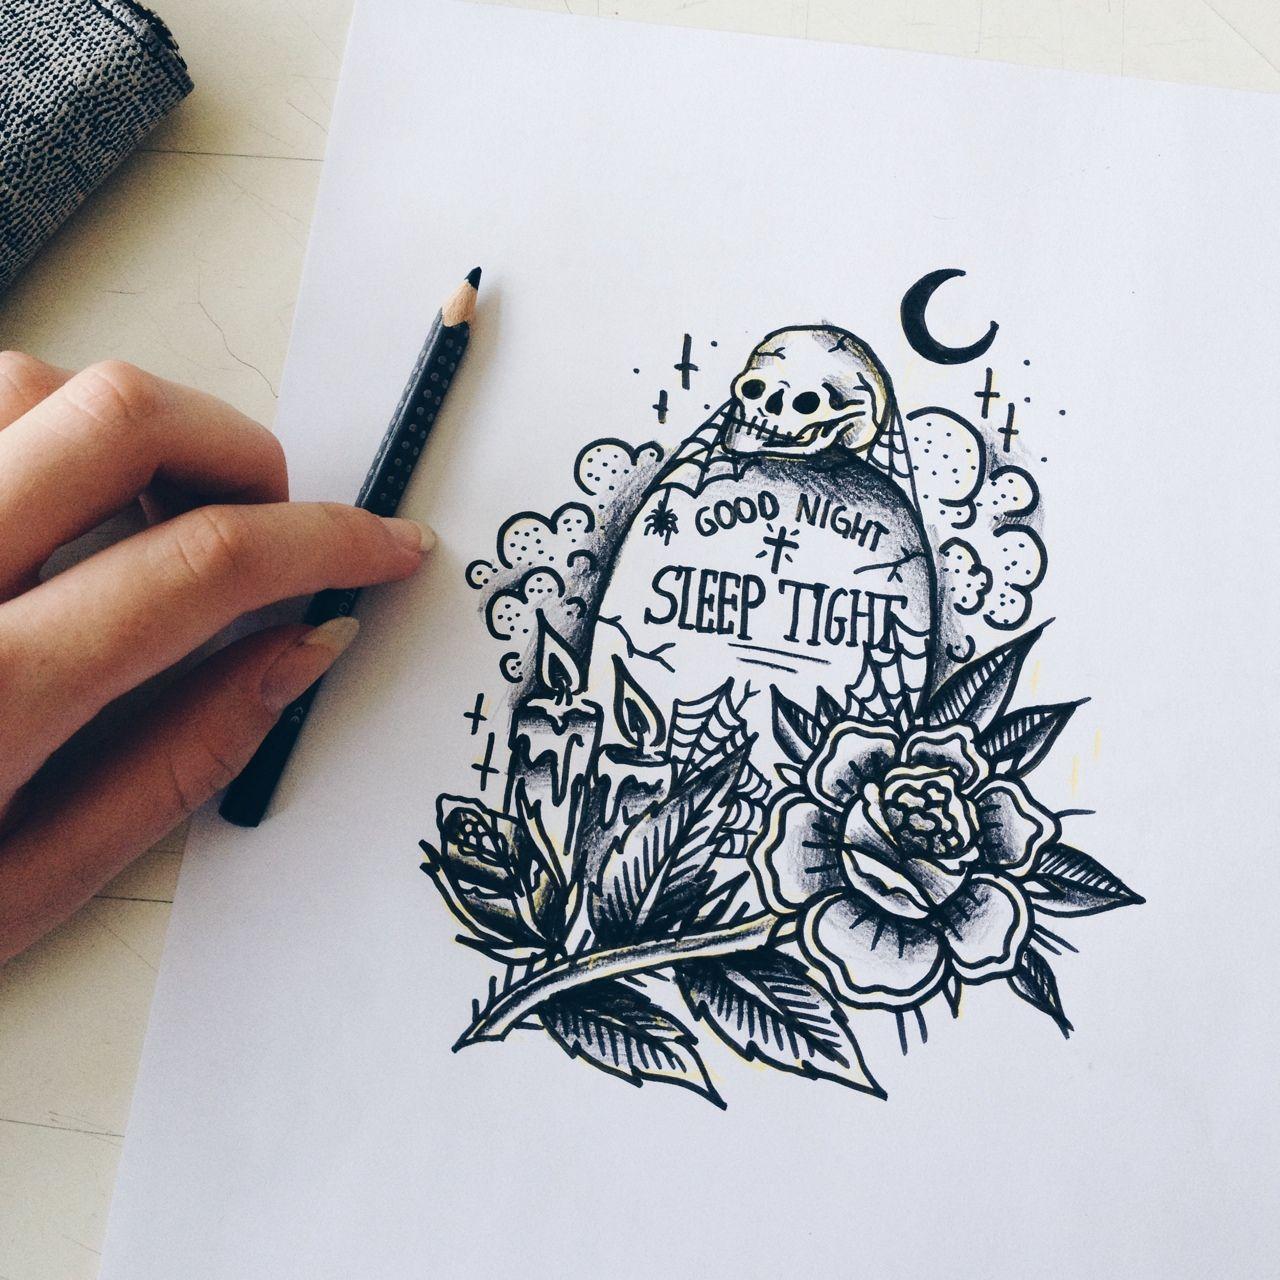 bla bla happy halloween and so on tattoo ideen pinte. Black Bedroom Furniture Sets. Home Design Ideas